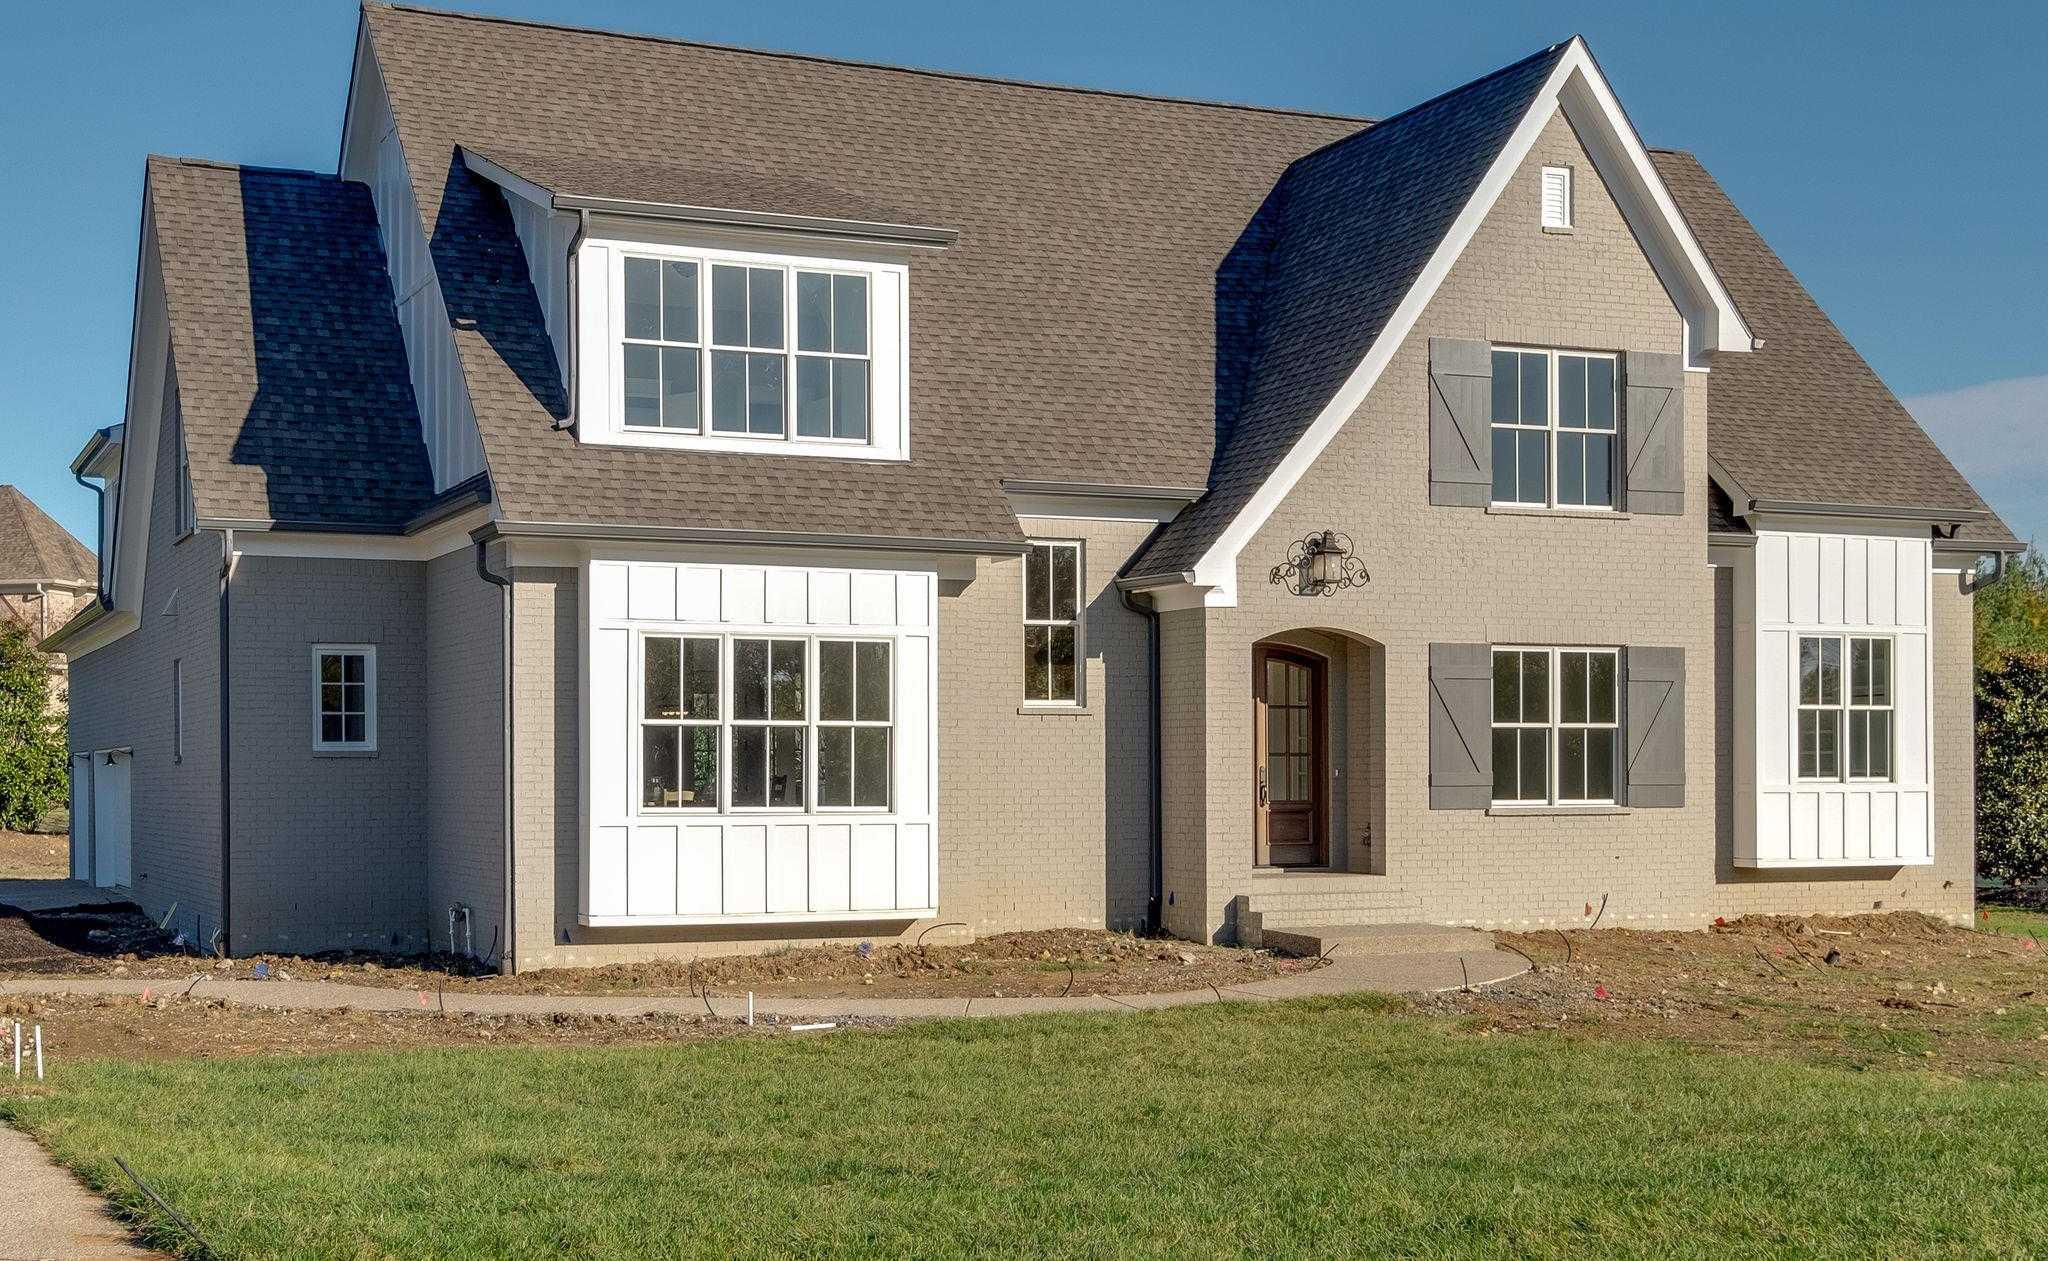 $1,295,000 - 5Br/5Ba -  for Sale in Legends Ridge, Franklin